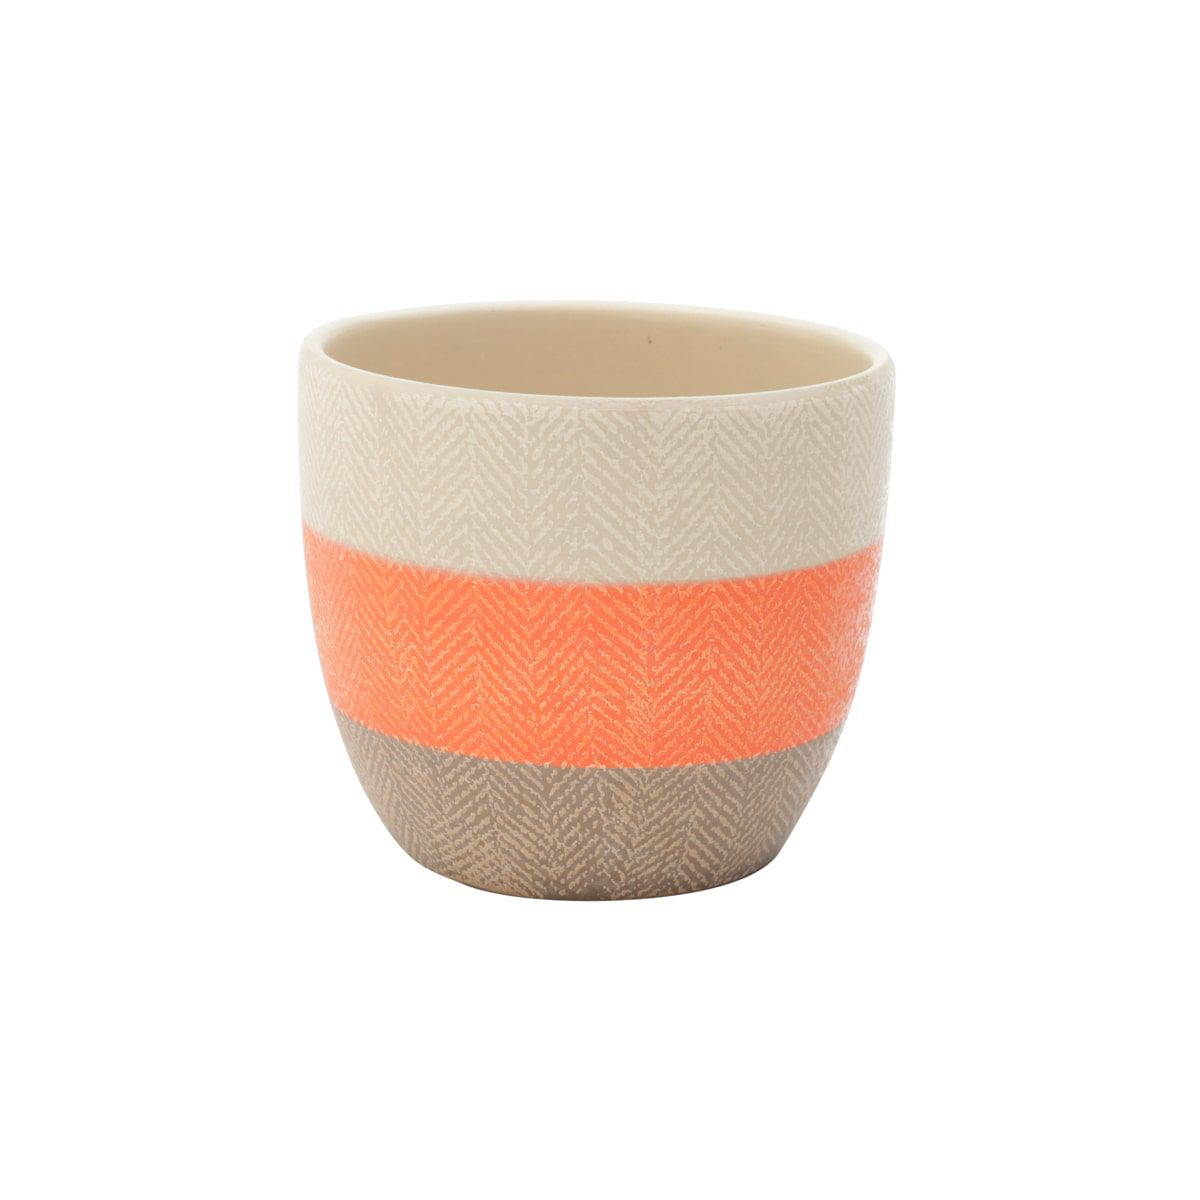 Cachepot Cerâmica Wool Style Cru/Marrom/Laranja 14X14X12CM